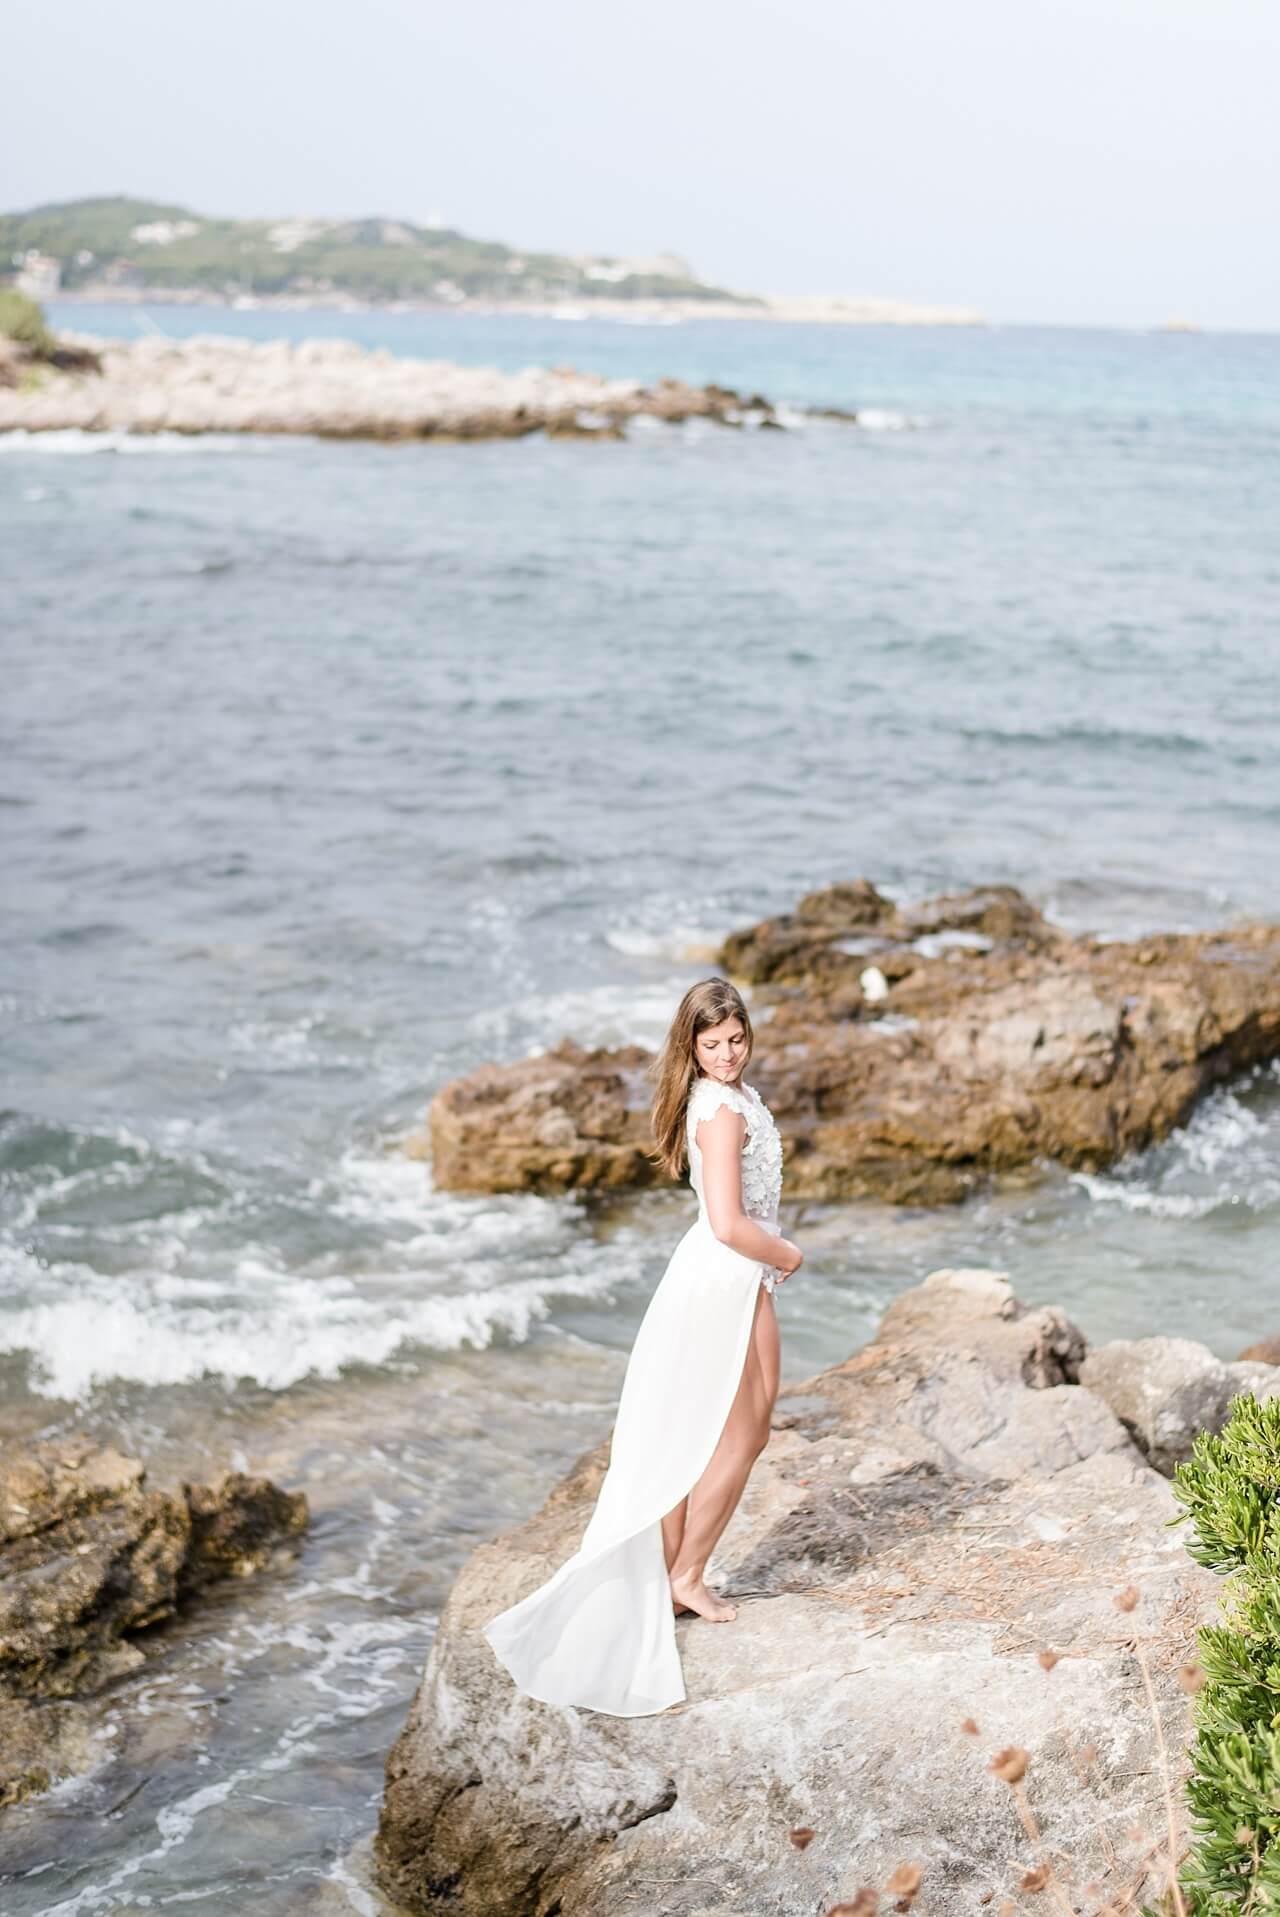 Rebecca Conte Fotografie: Freundinnen-Shooting auf Mallorca 03